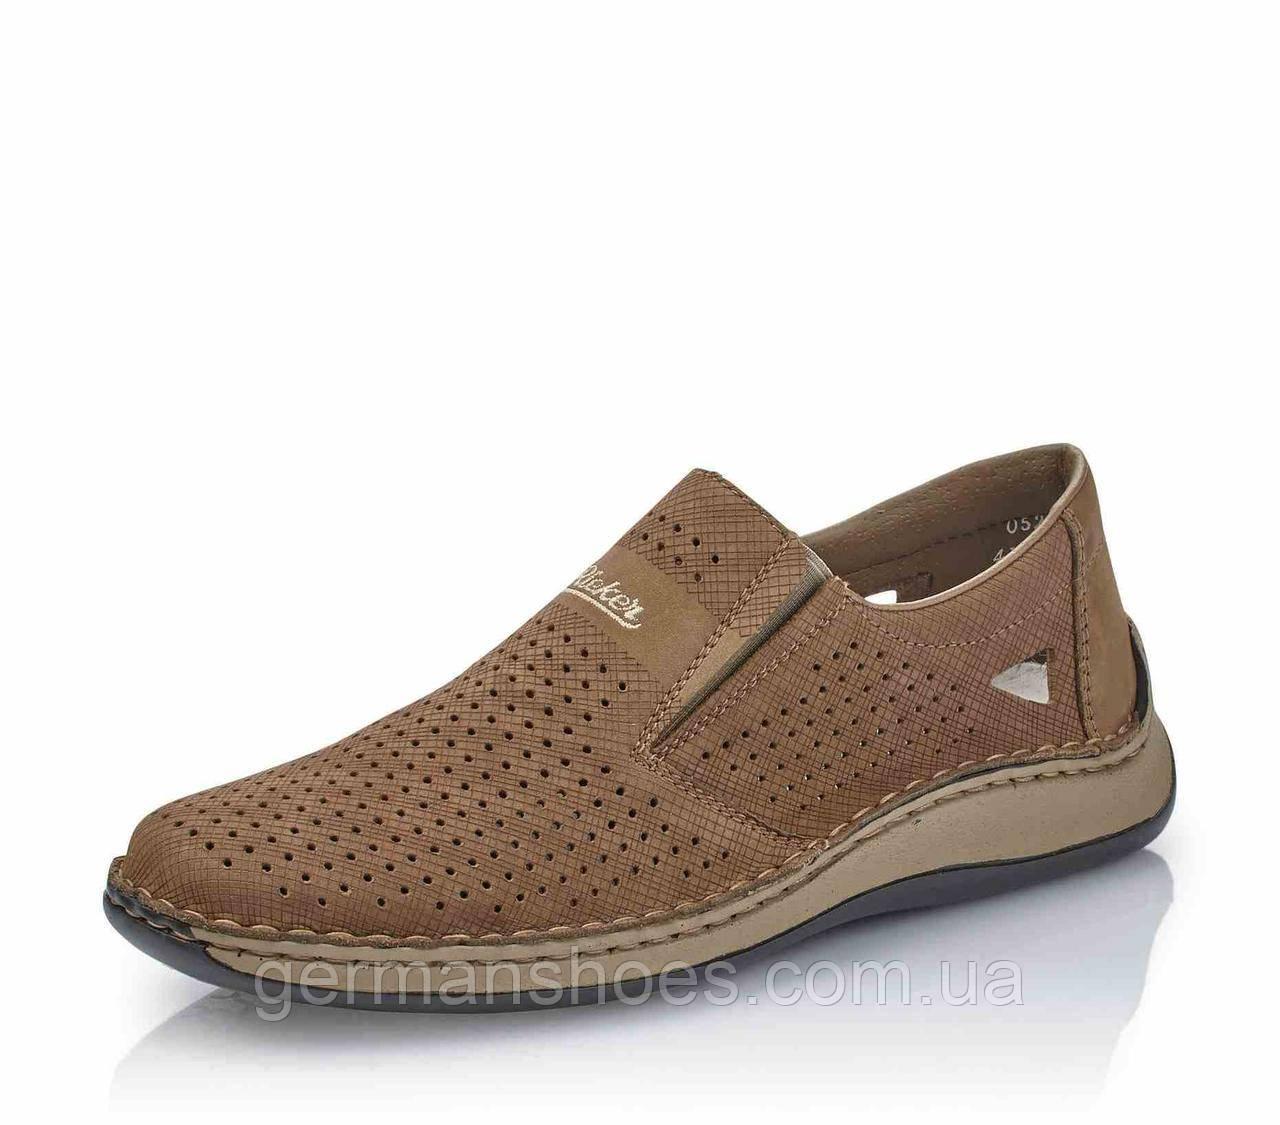 4a63c1022 Туфли мужские Rieker 05289-64 - Интернет-магазин обуви